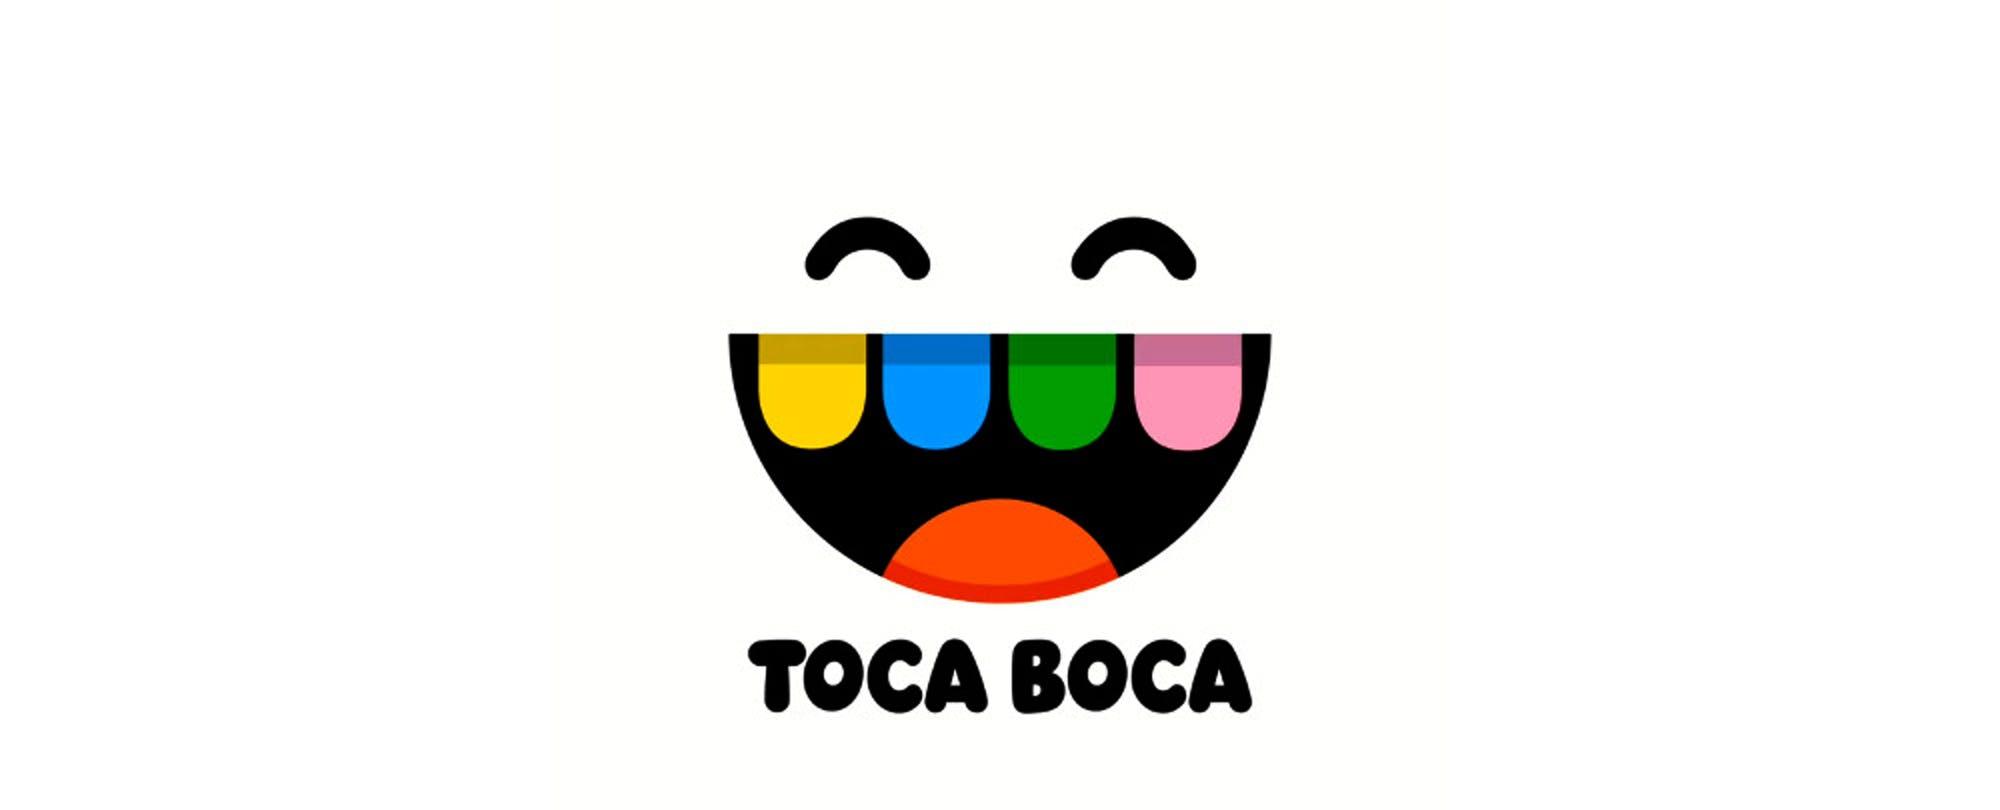 What's Driving Toca Boca's 100 Million Downloads?